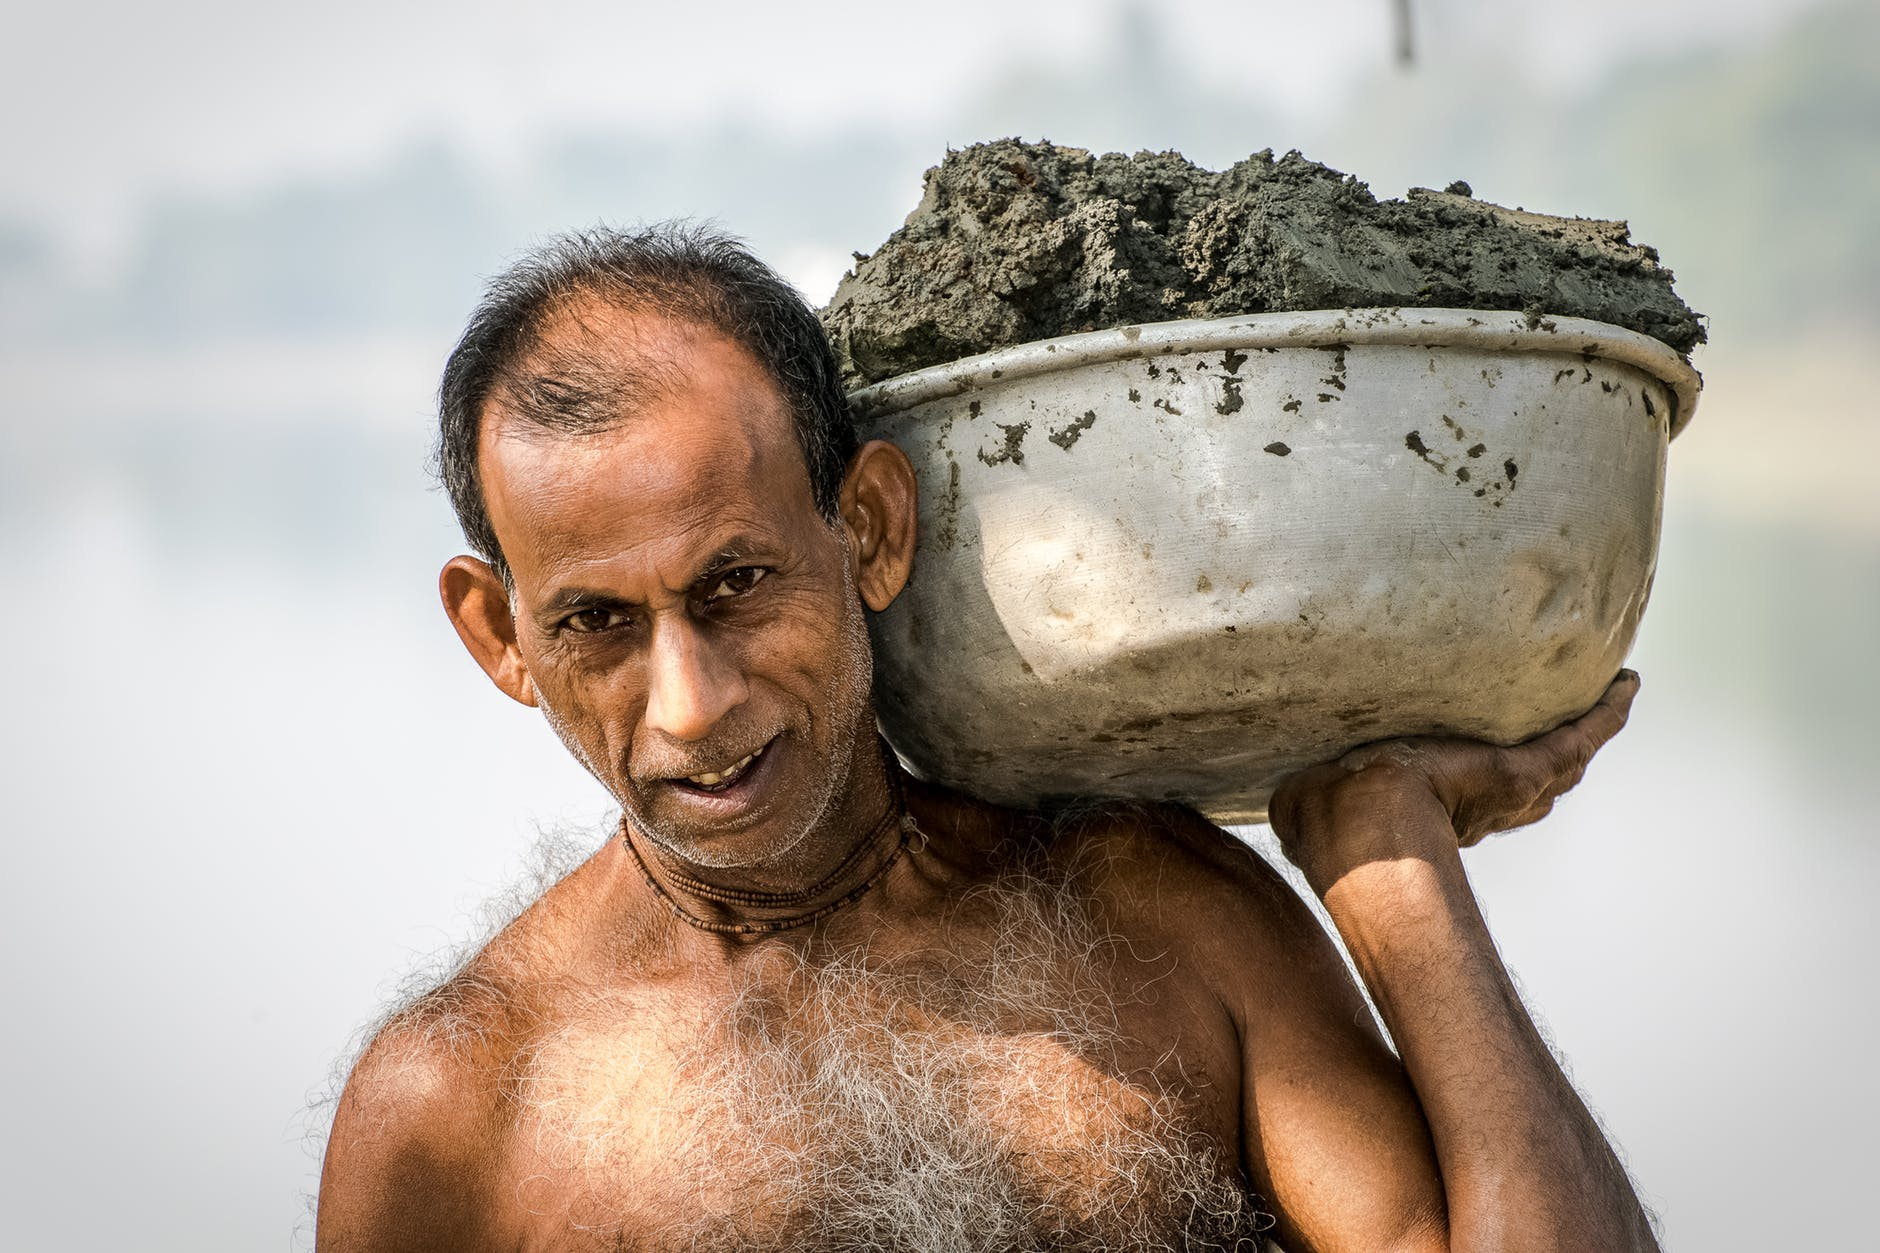 man carrying bucket of mud